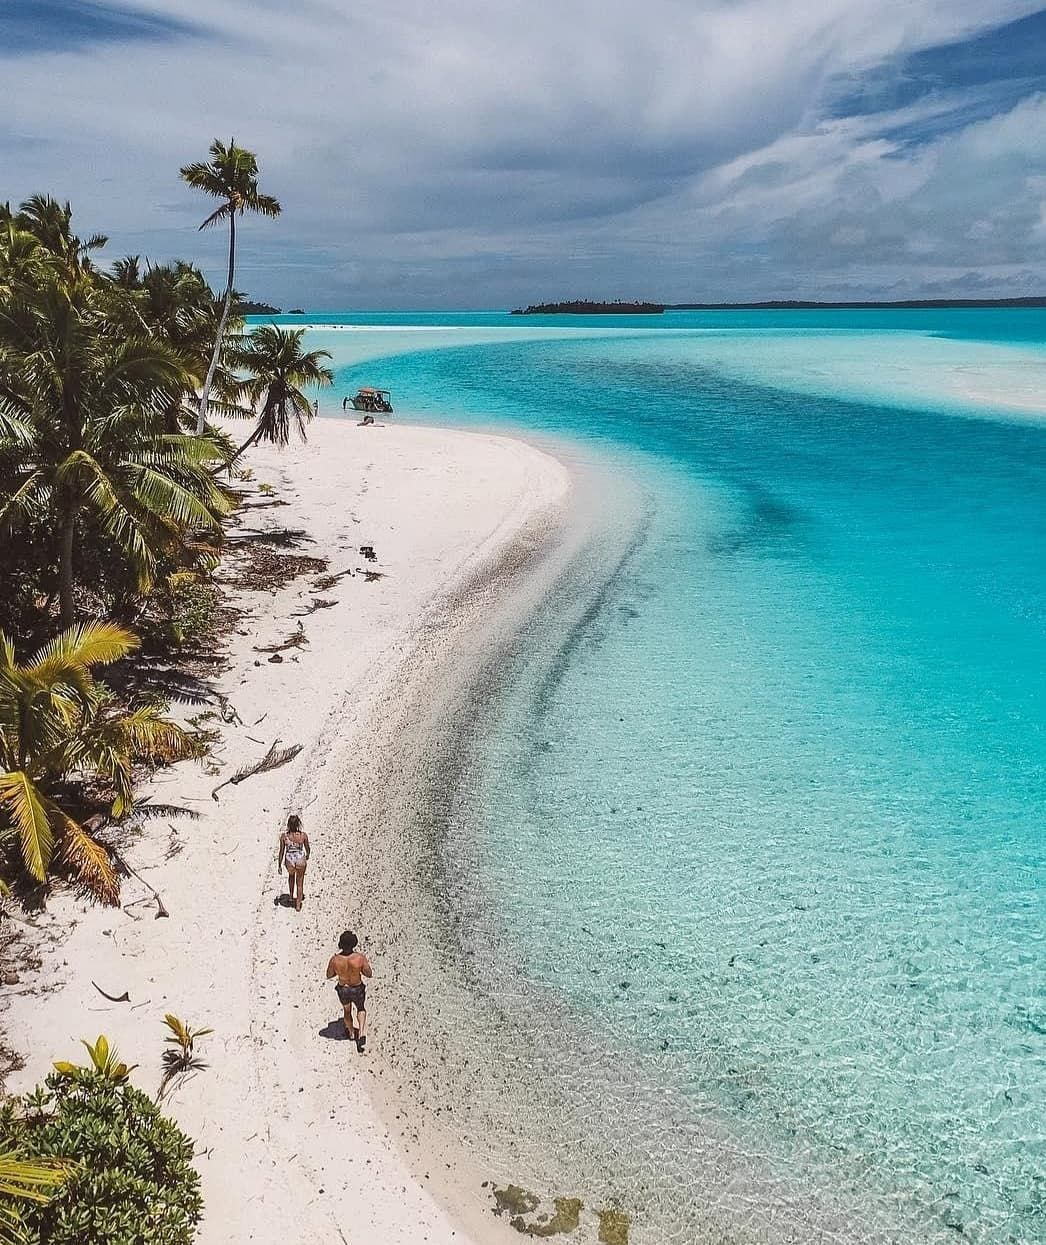 Cook Islands Beaches: Beach Escape In Paradise... 🏝 📍Aitutaki, Cook Islands 📷 By